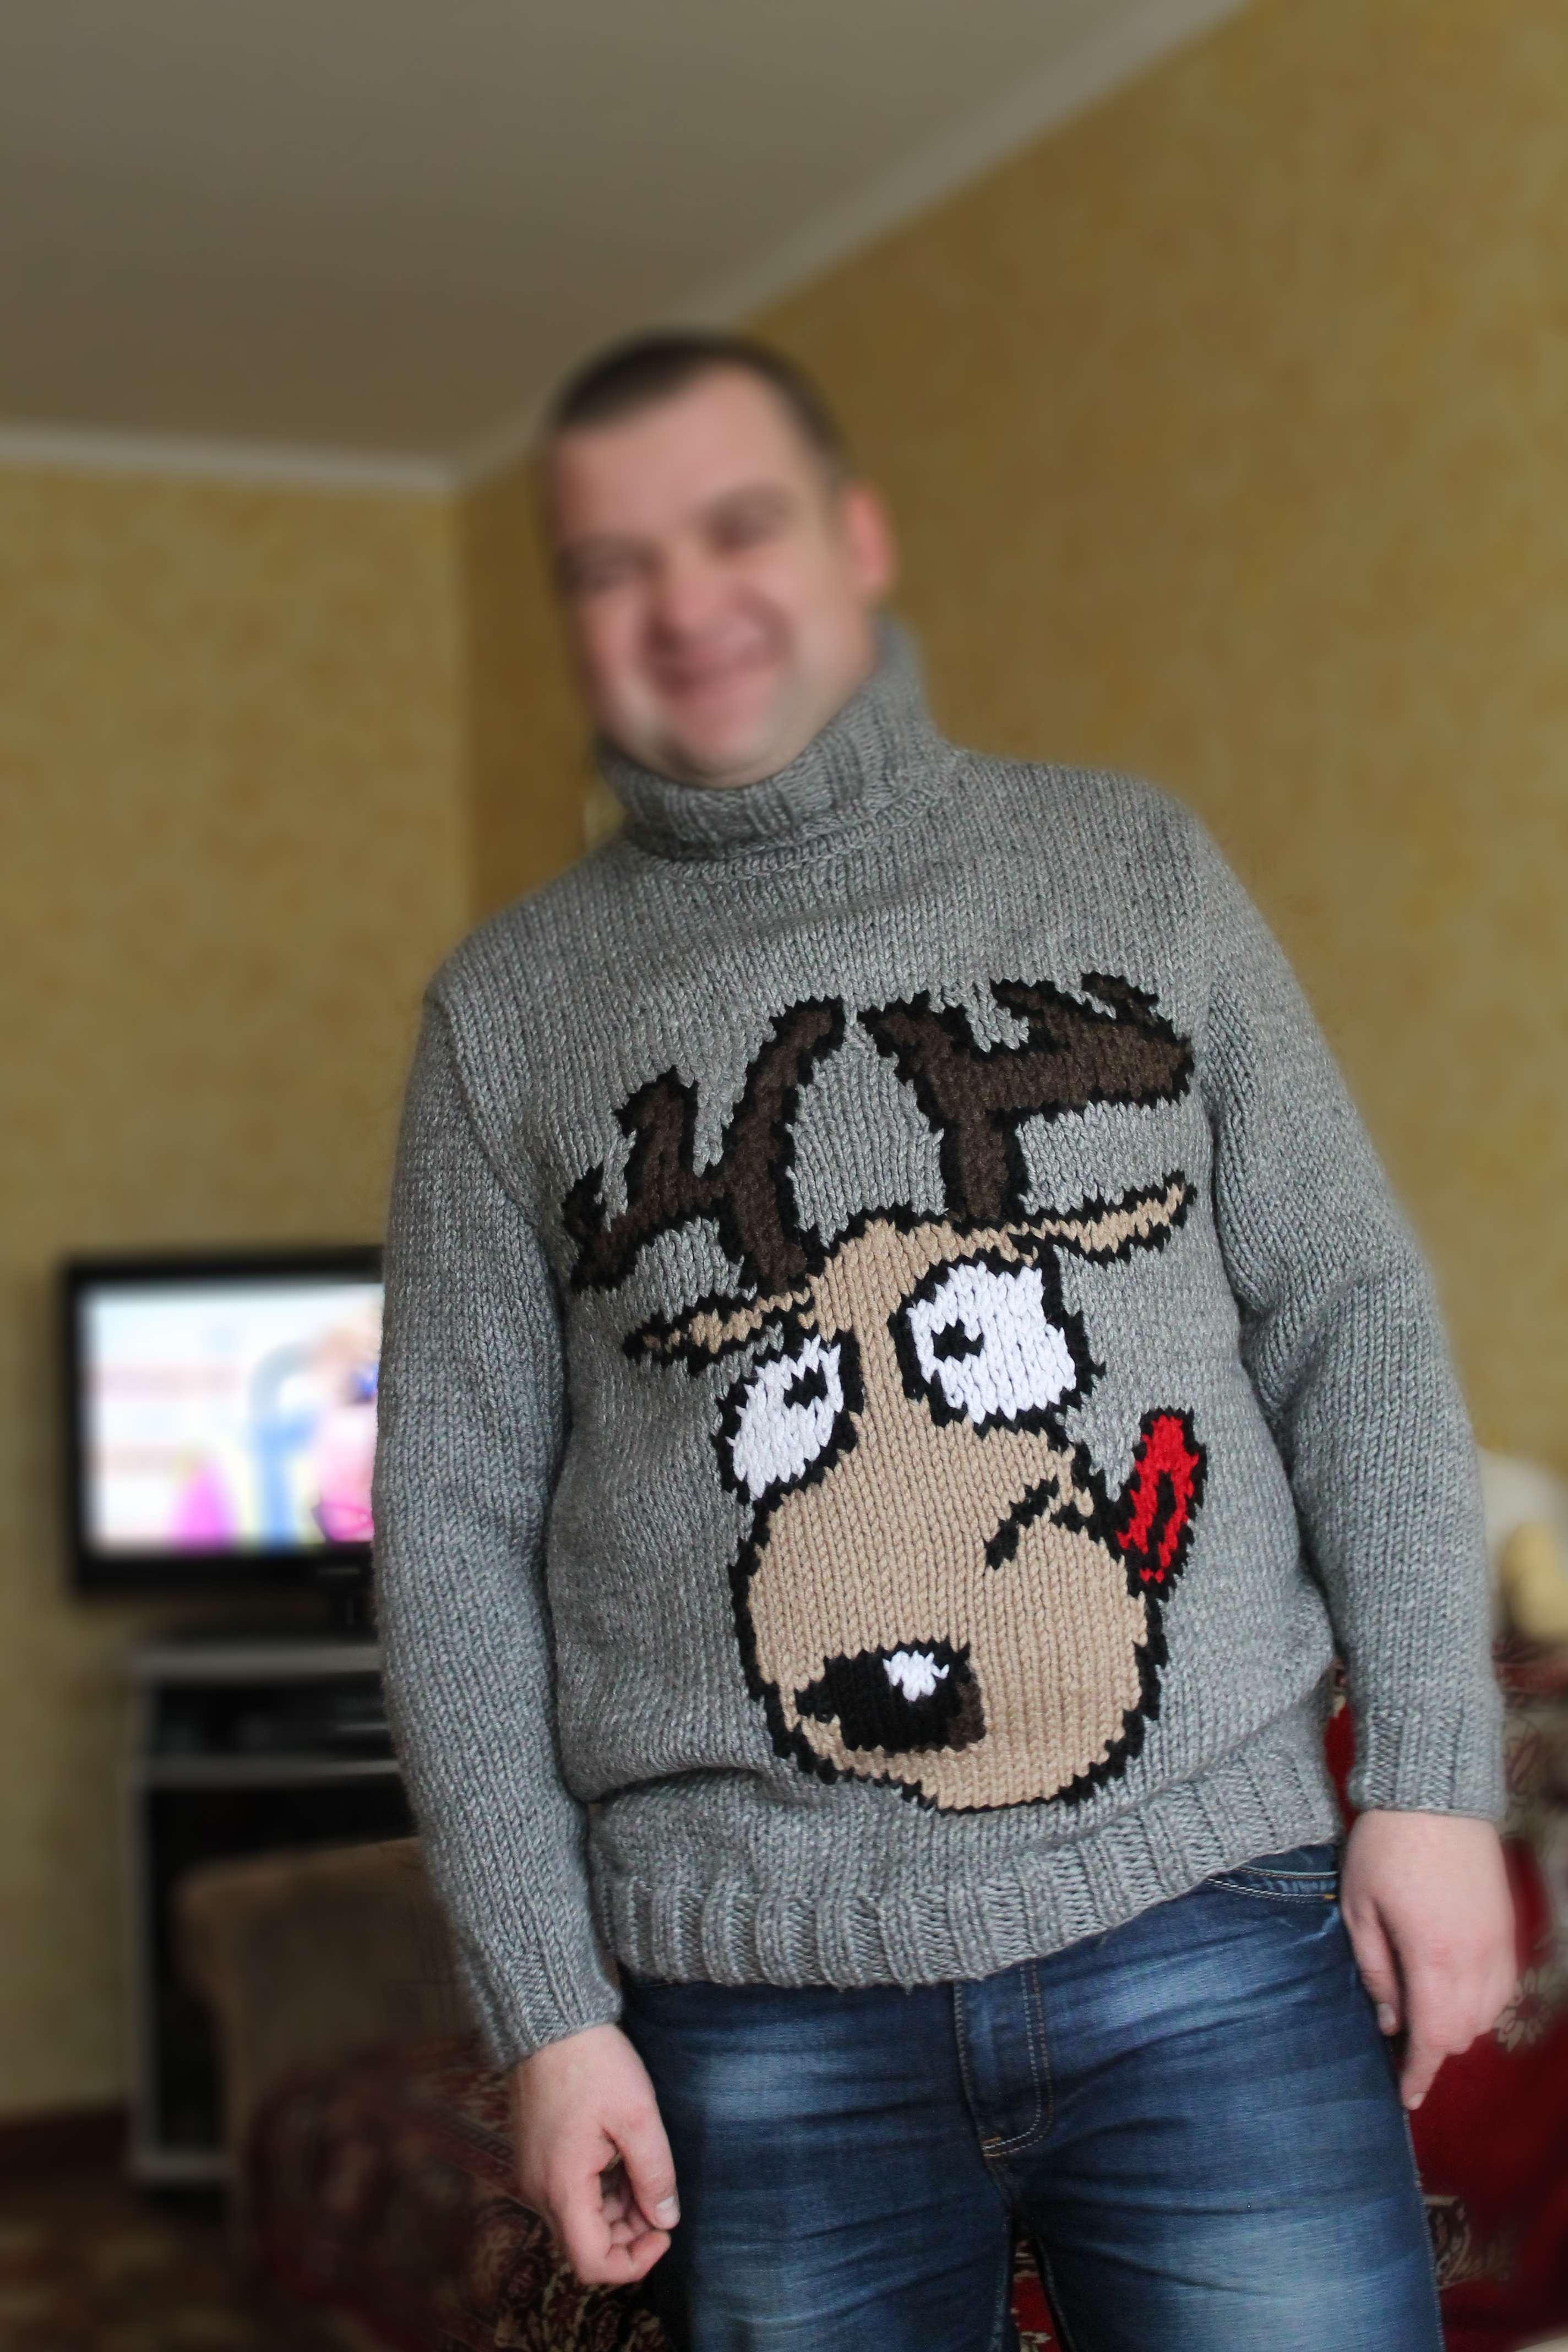 Свитер с оленями схема вязания спицами фото 991